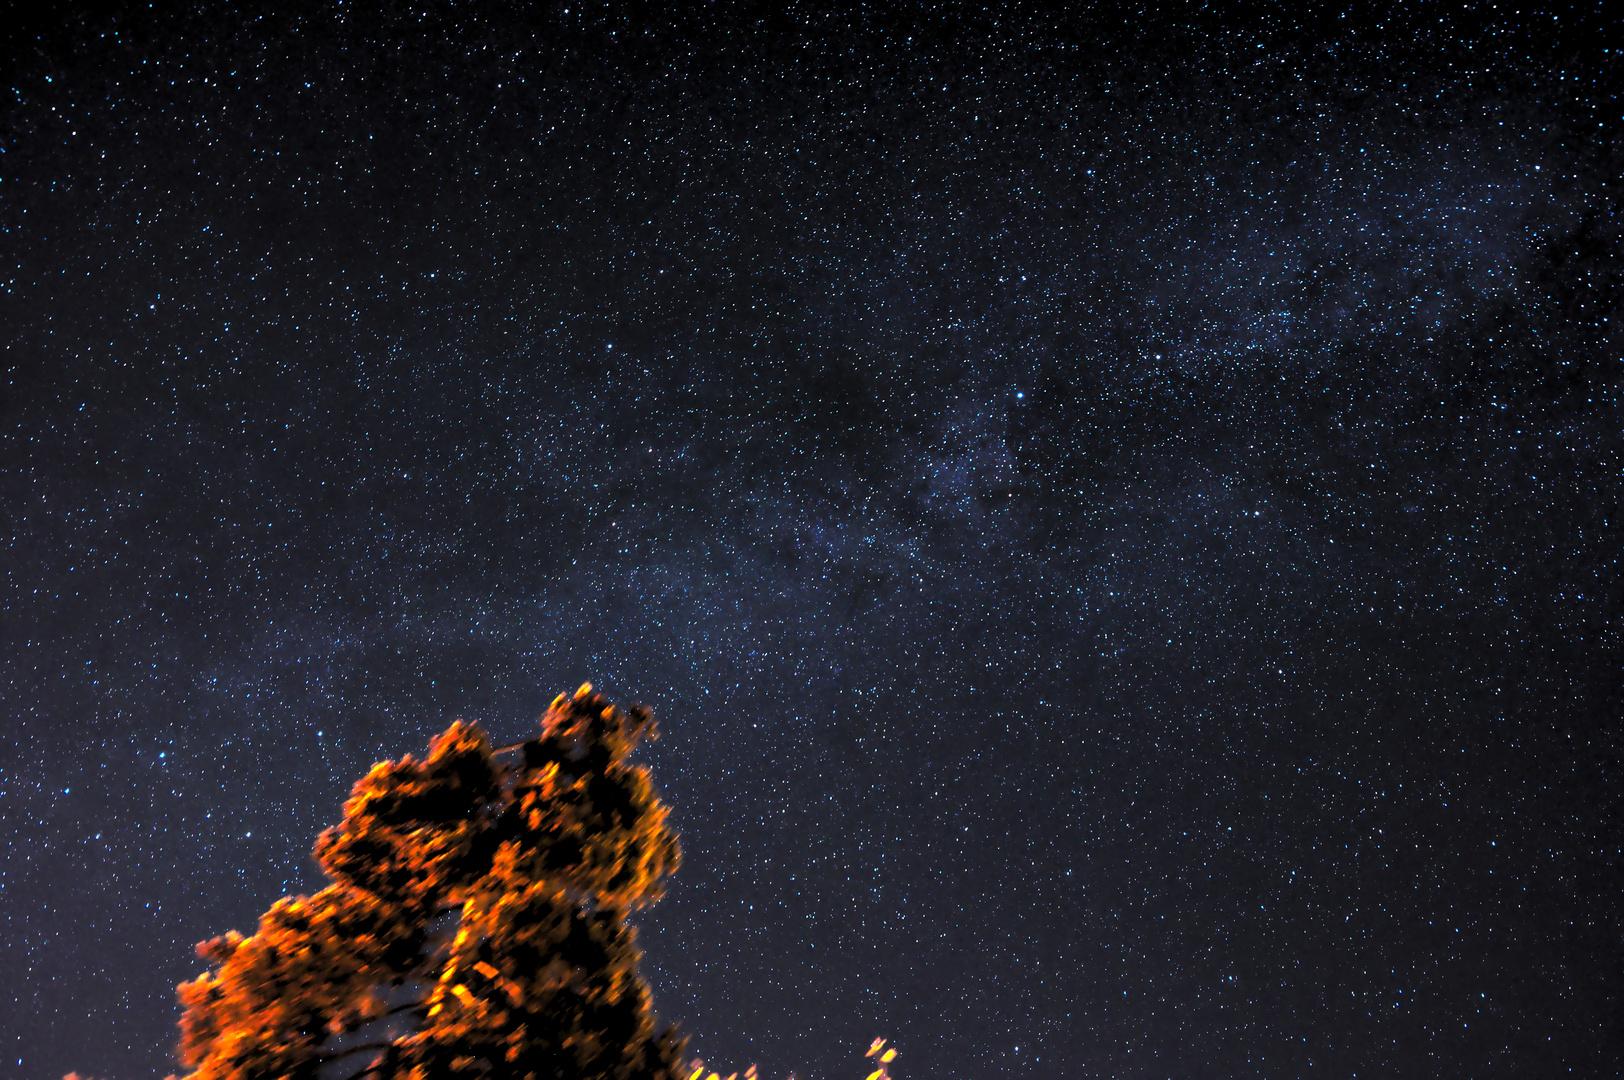 Nachts in Oberstdorf